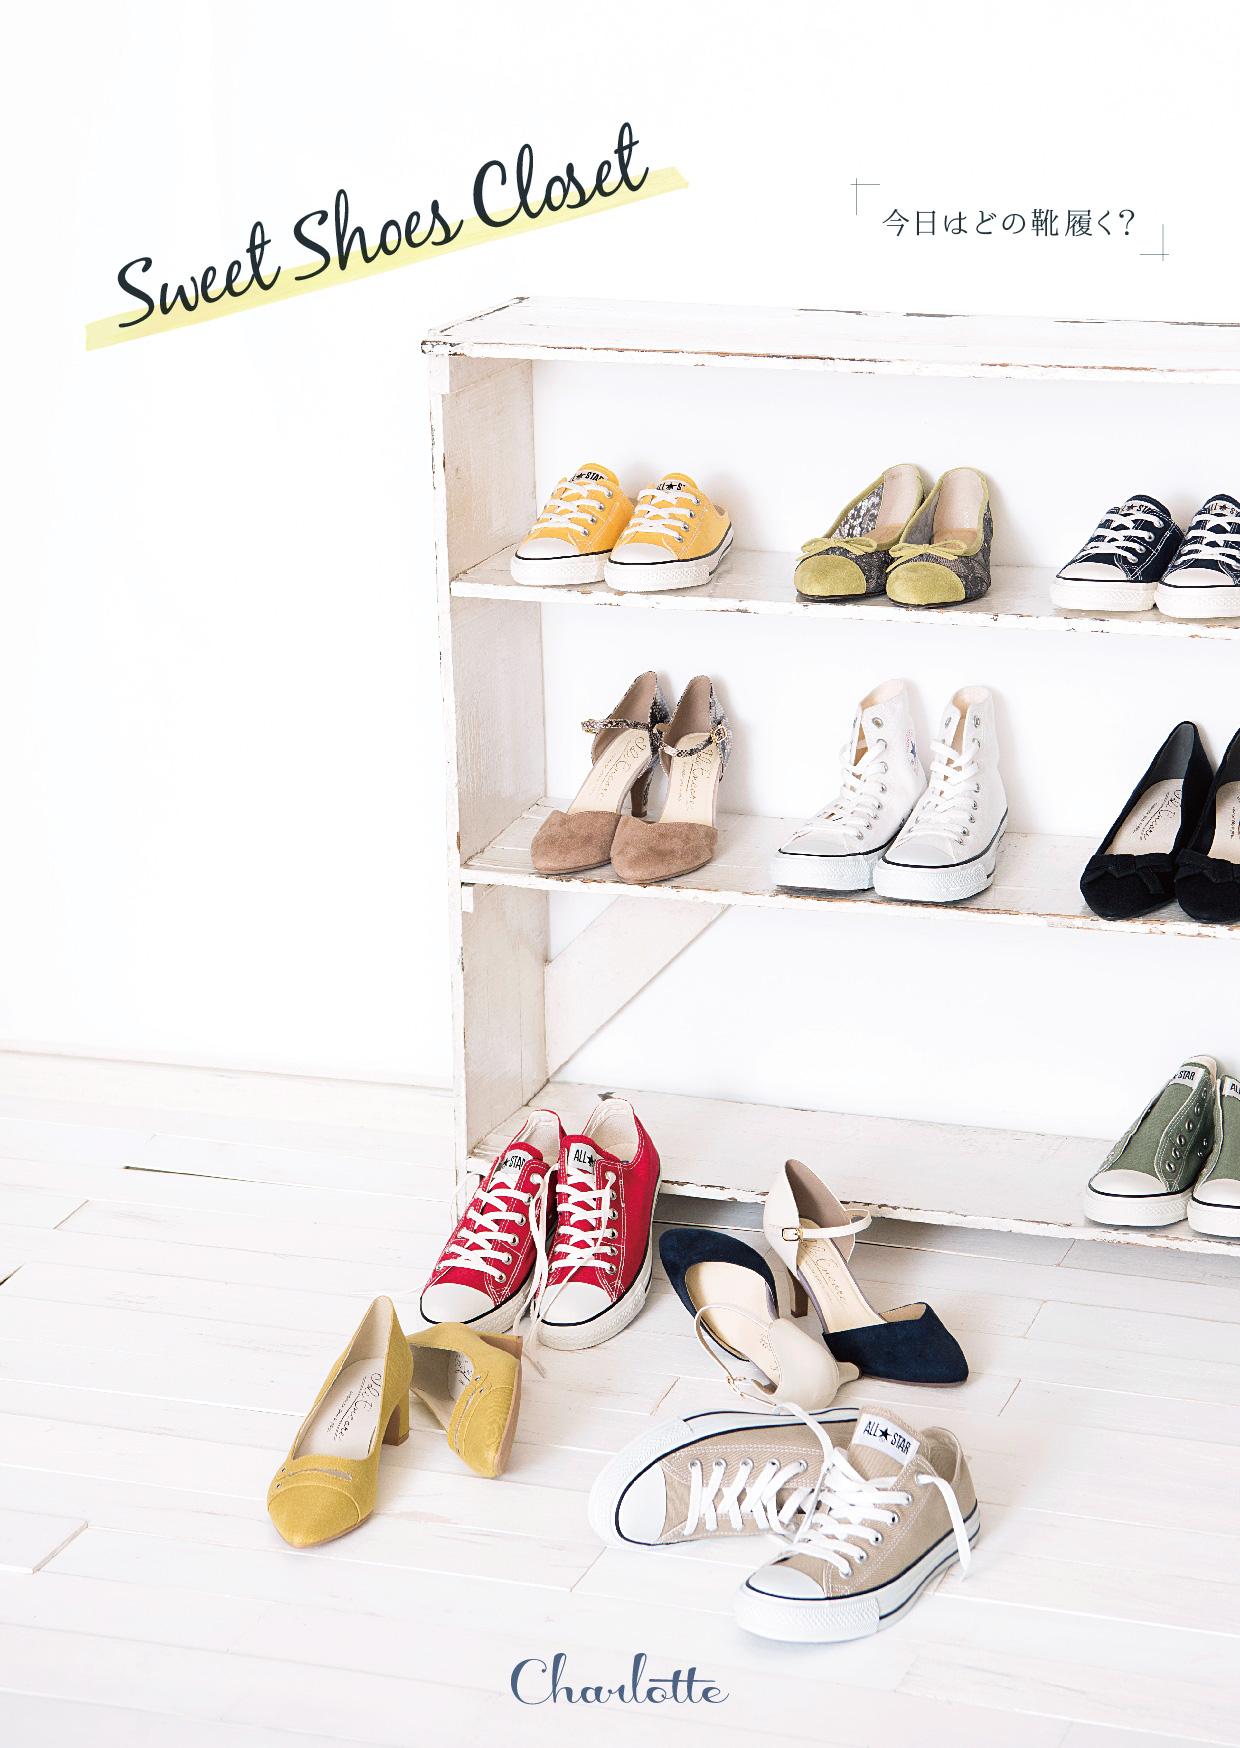 Sweet shoes closet